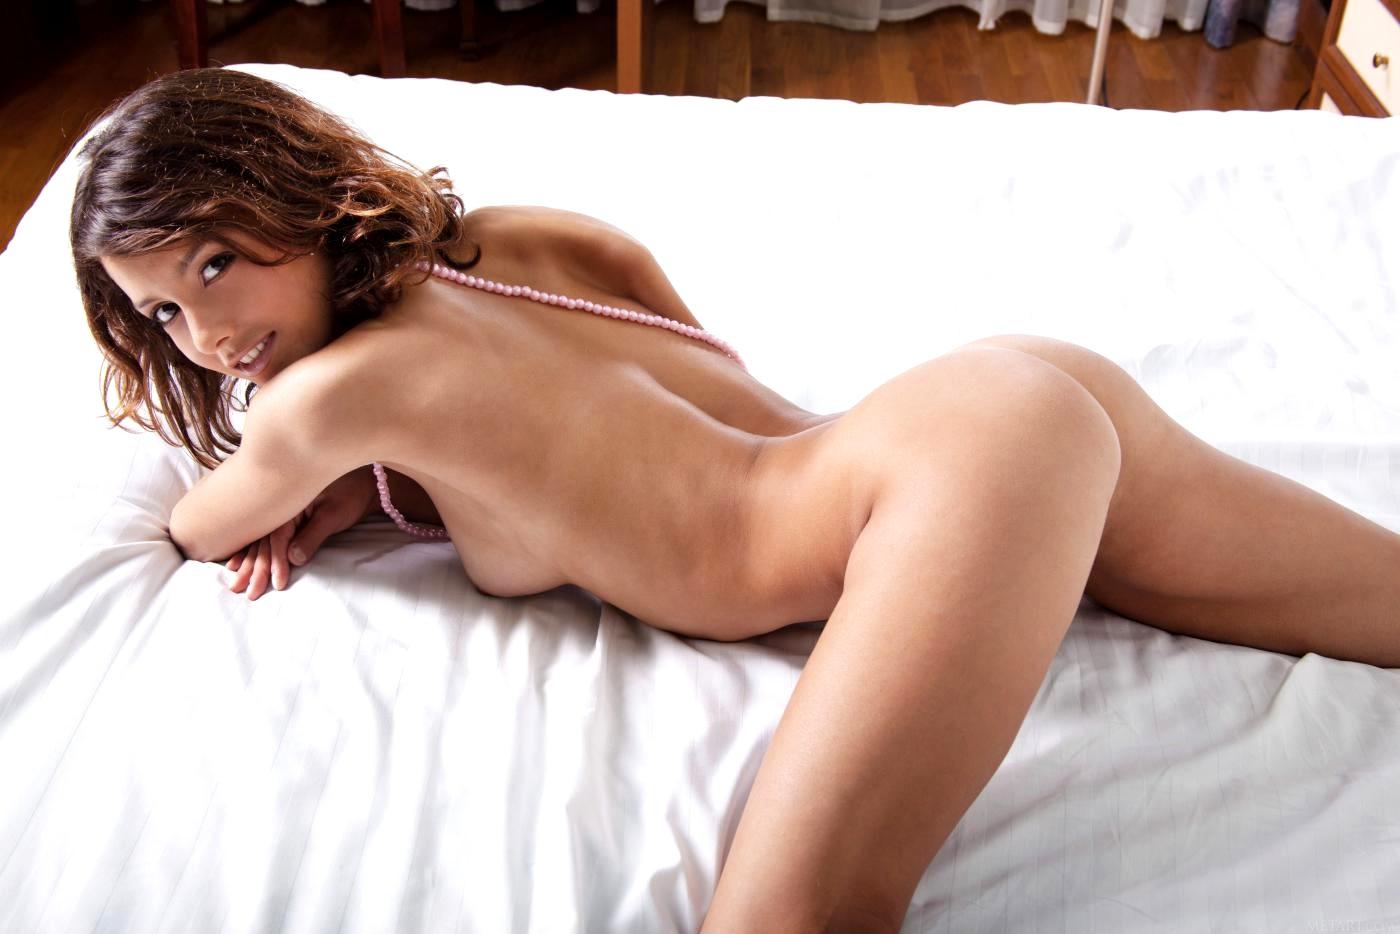 Free erotic women videos